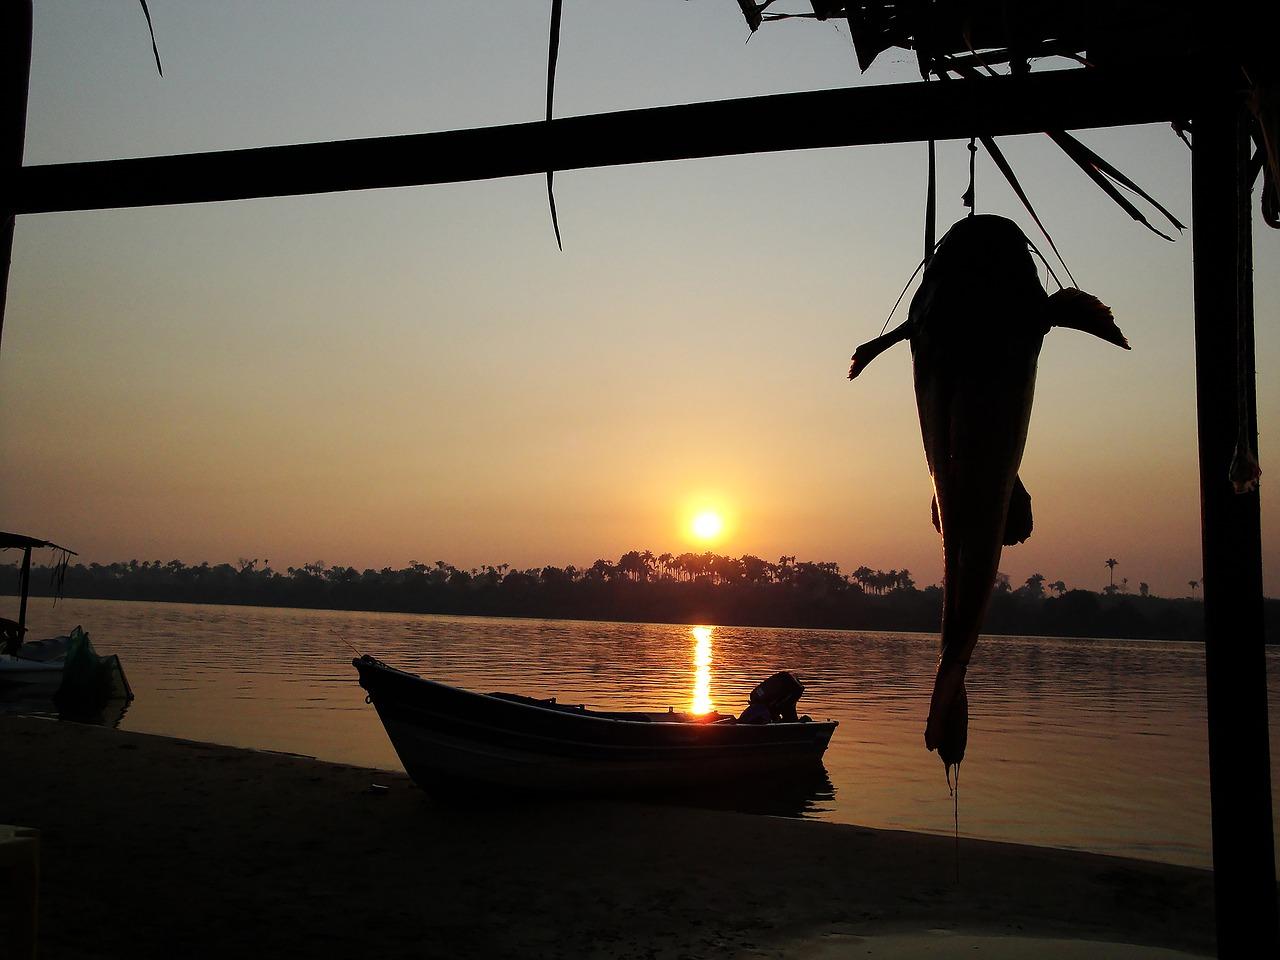 sunset_rio_sol_amazon_fishing_PD